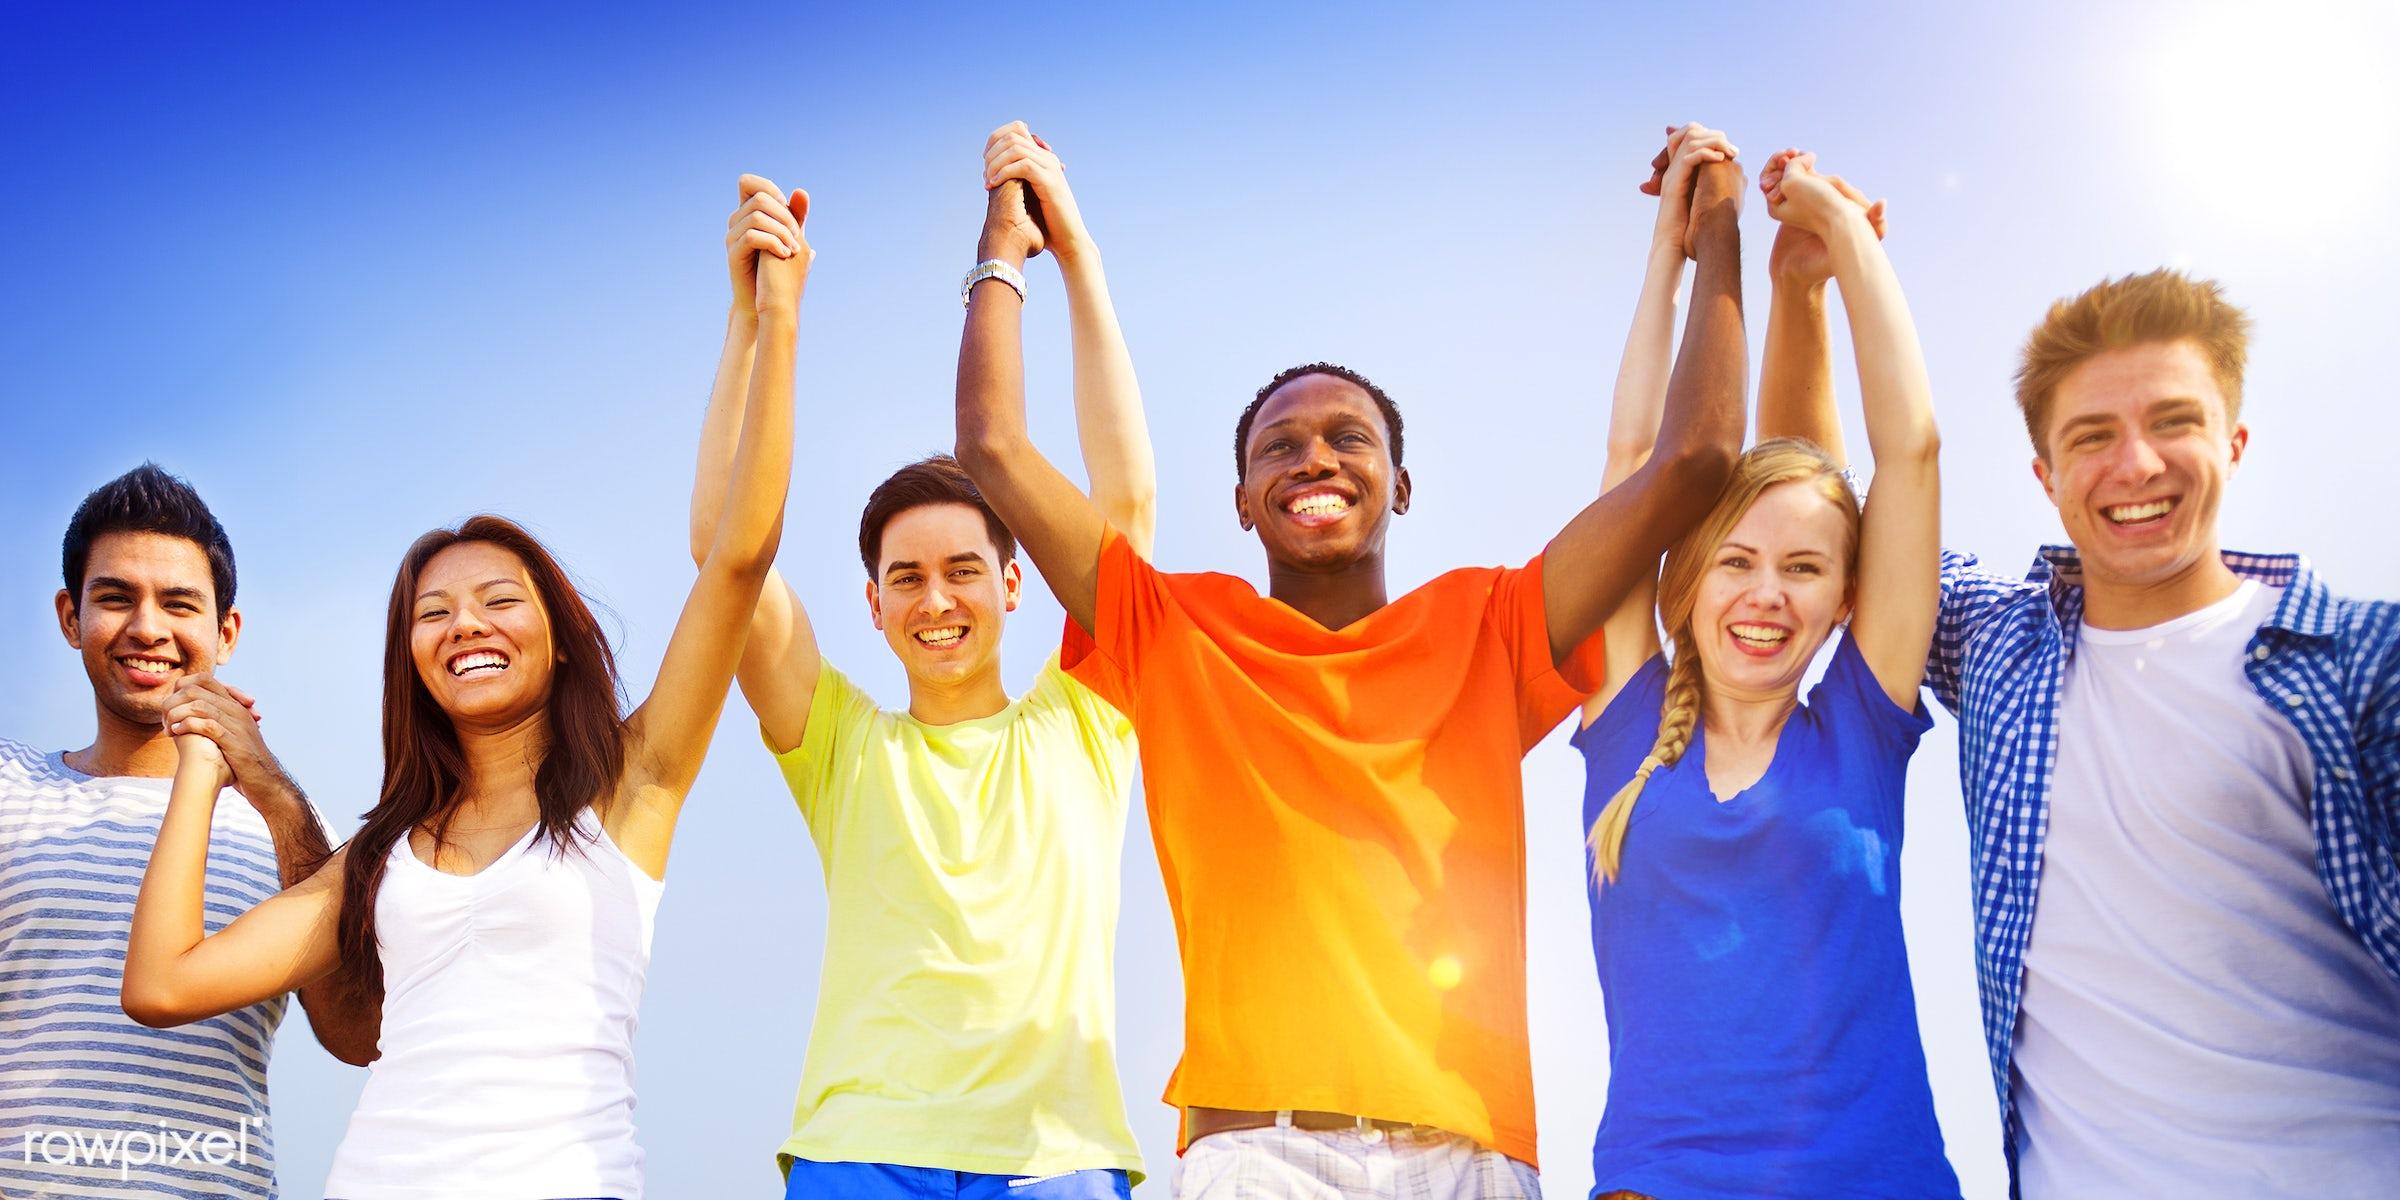 achieve, achievement, arms raised, celebration, cheerful, communication, community, concepts, connection, freedom,...